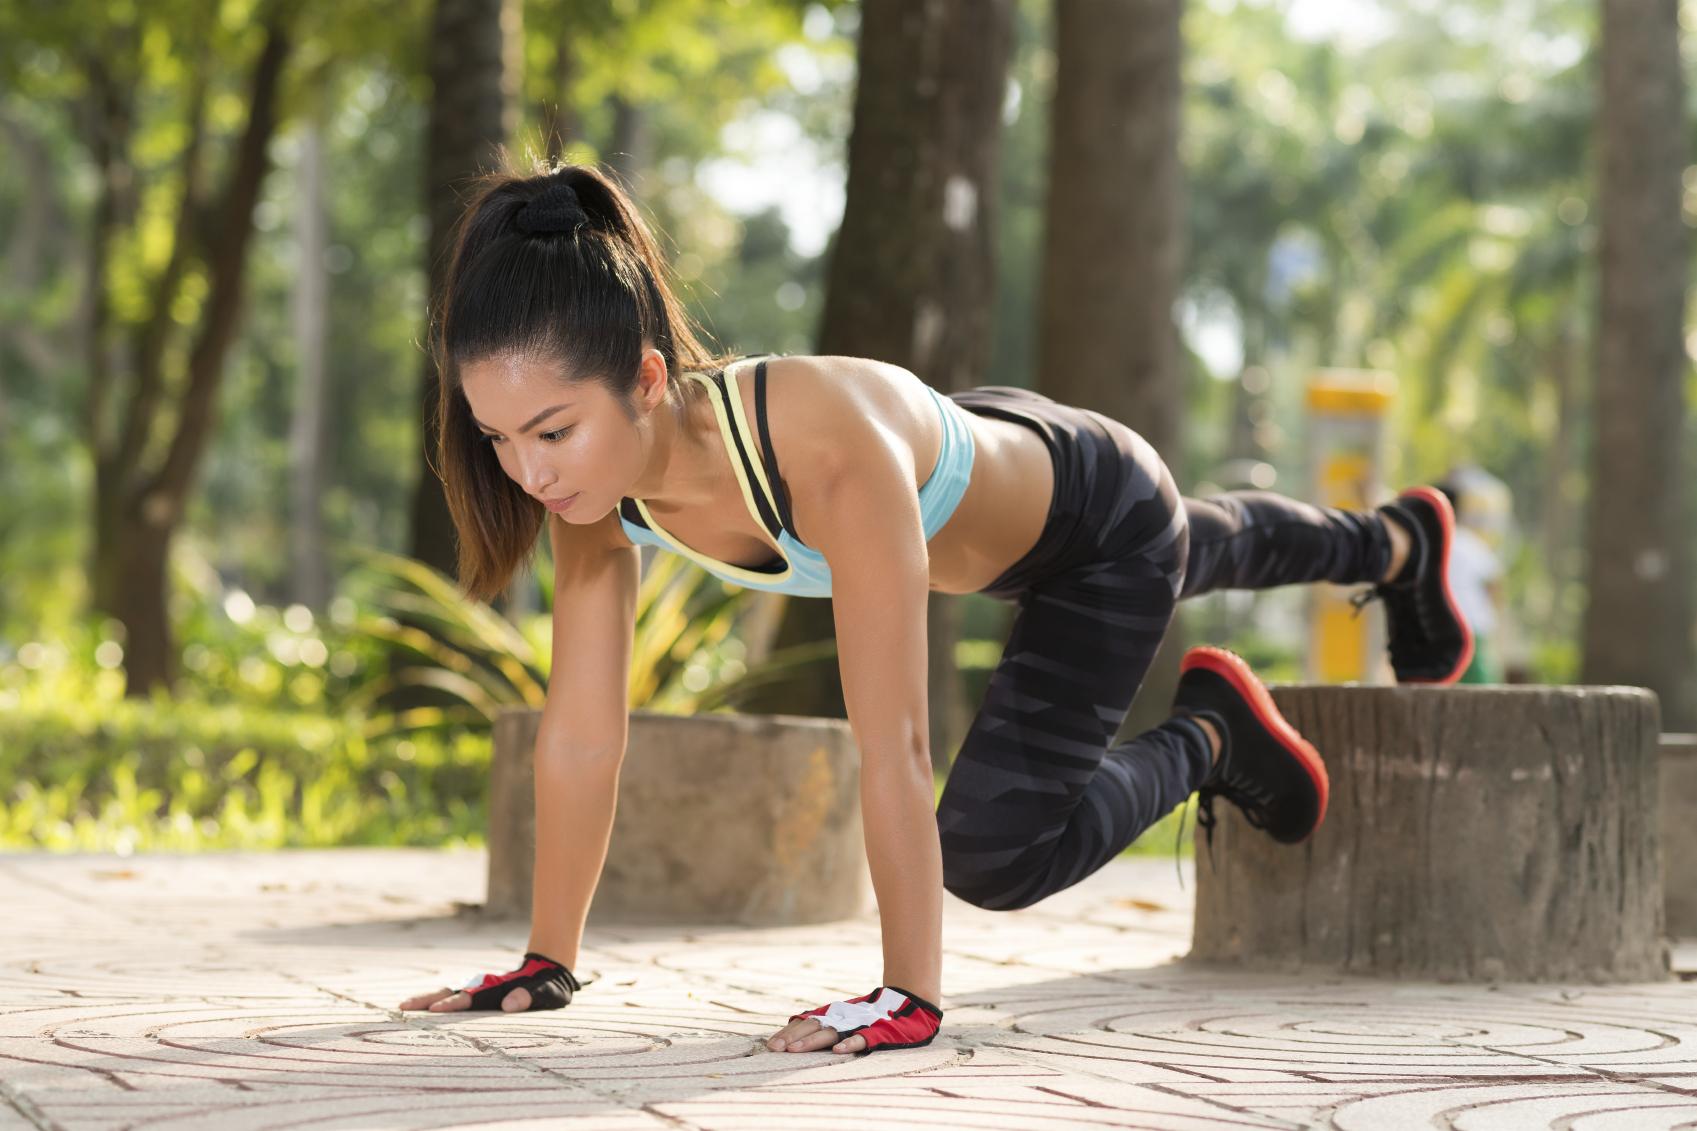 Calorie-Busting Leg Matrix